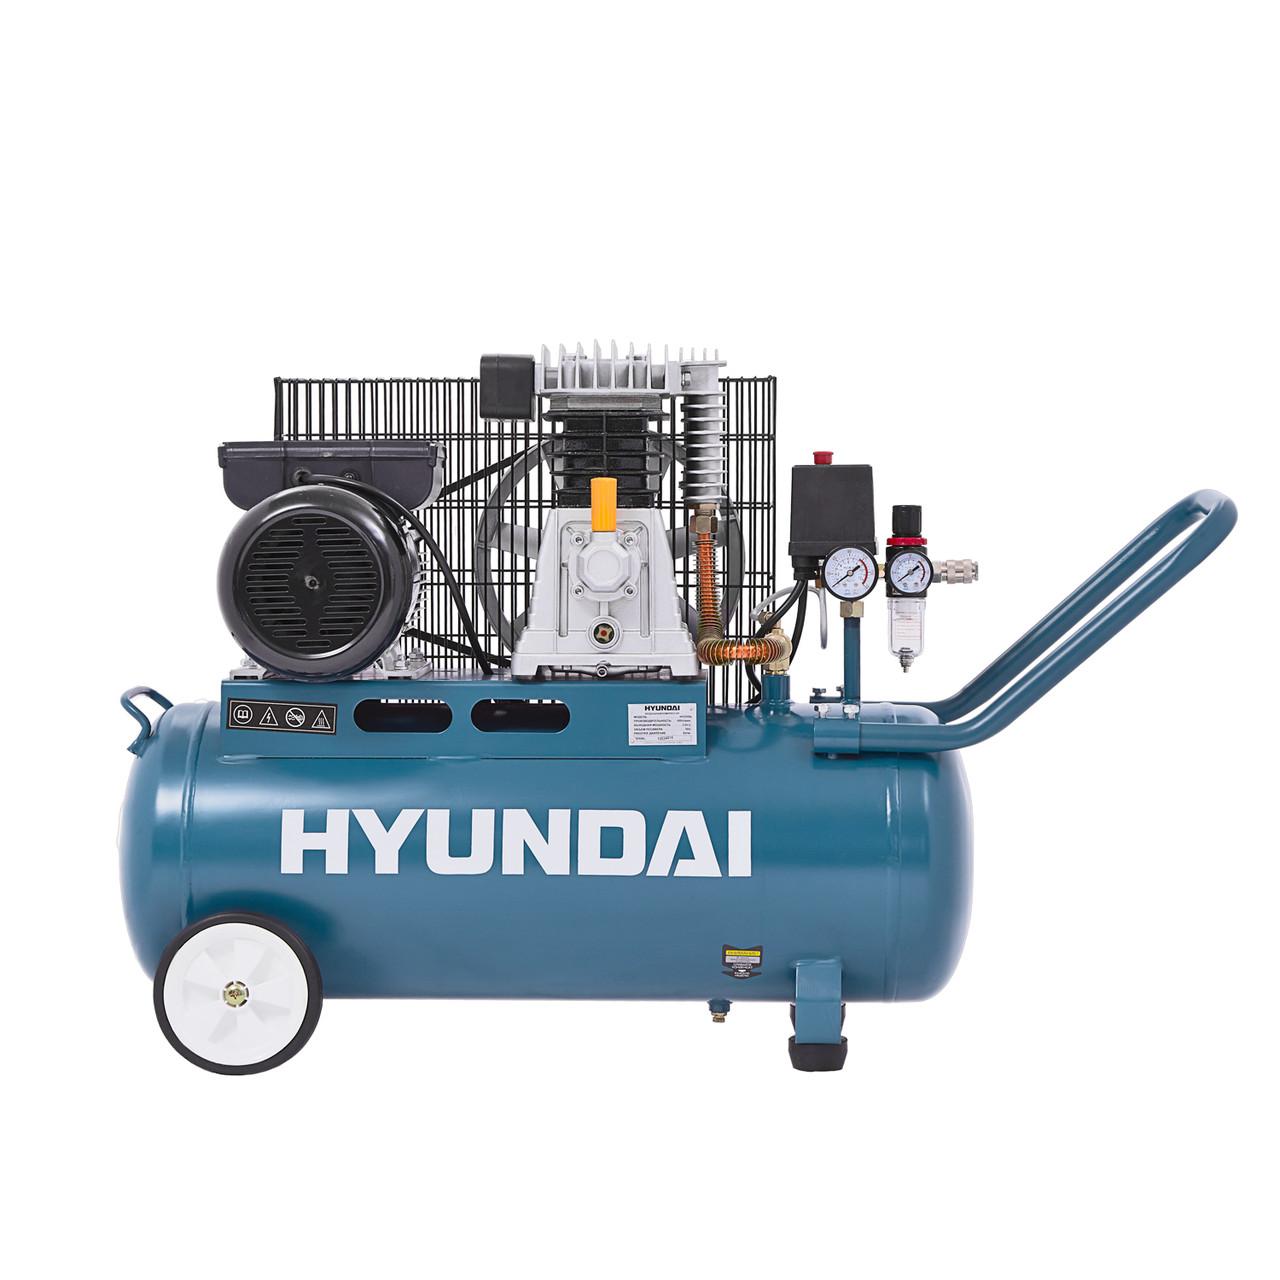 компрессор hyundai hy-2555